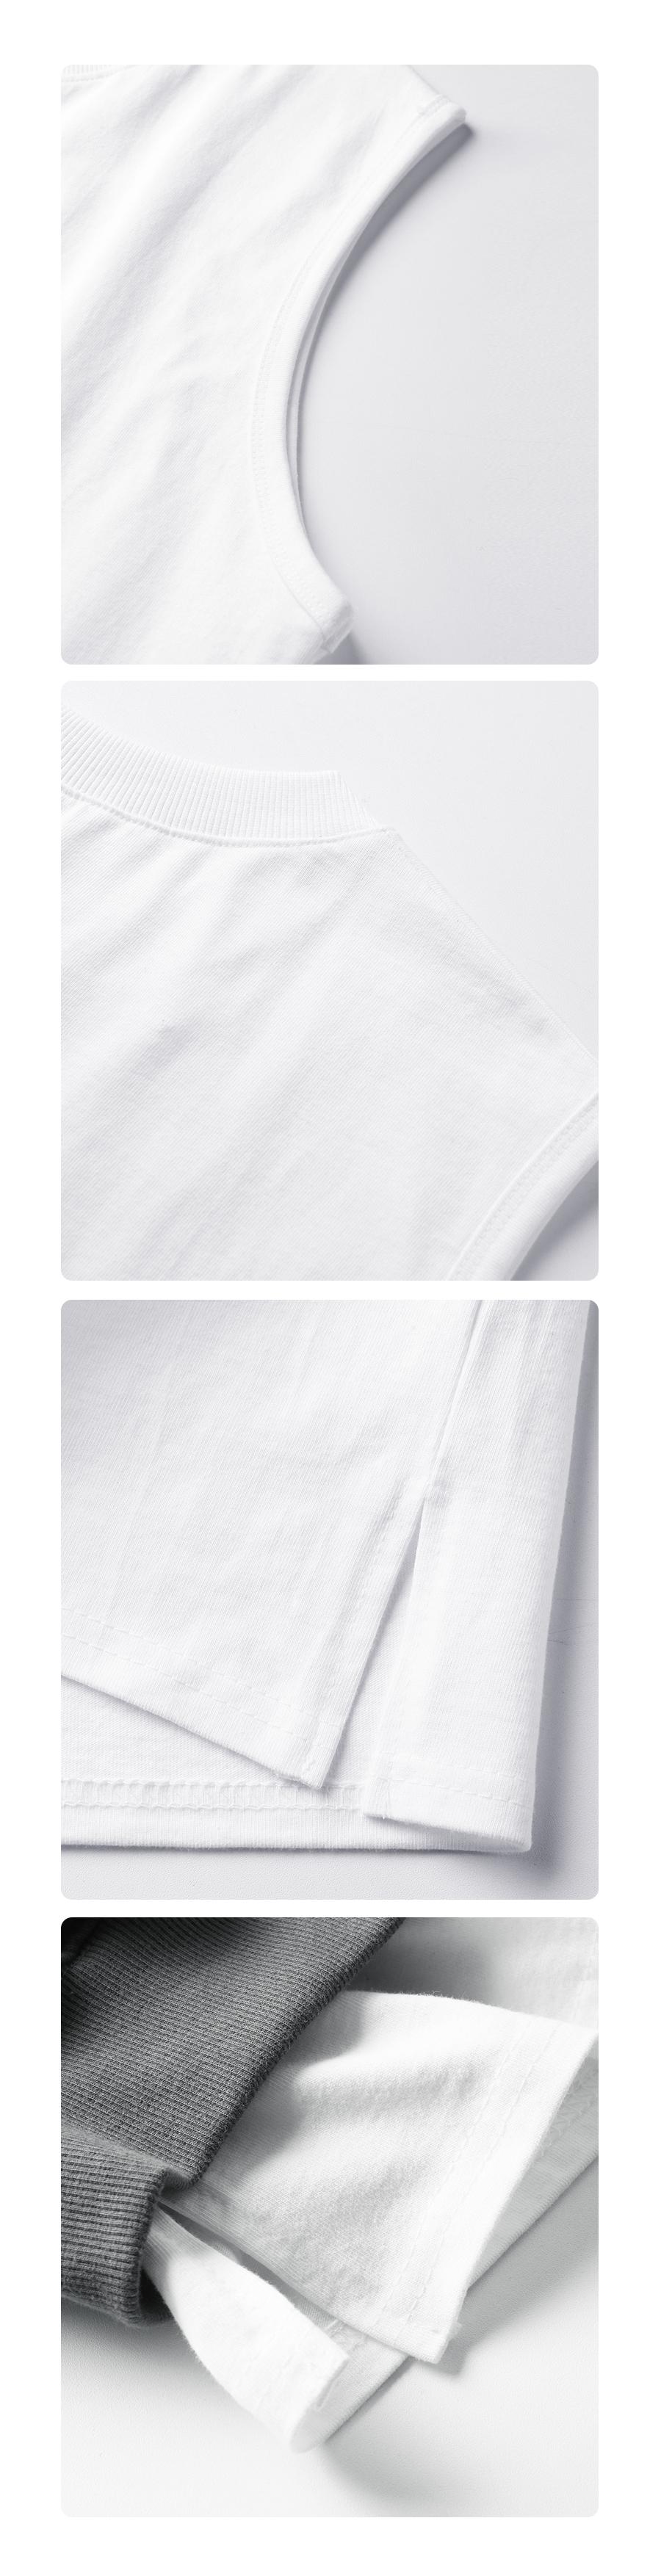 [UNISEX] 레이어드 오버핏 슬리브리스 나시 (화이트)